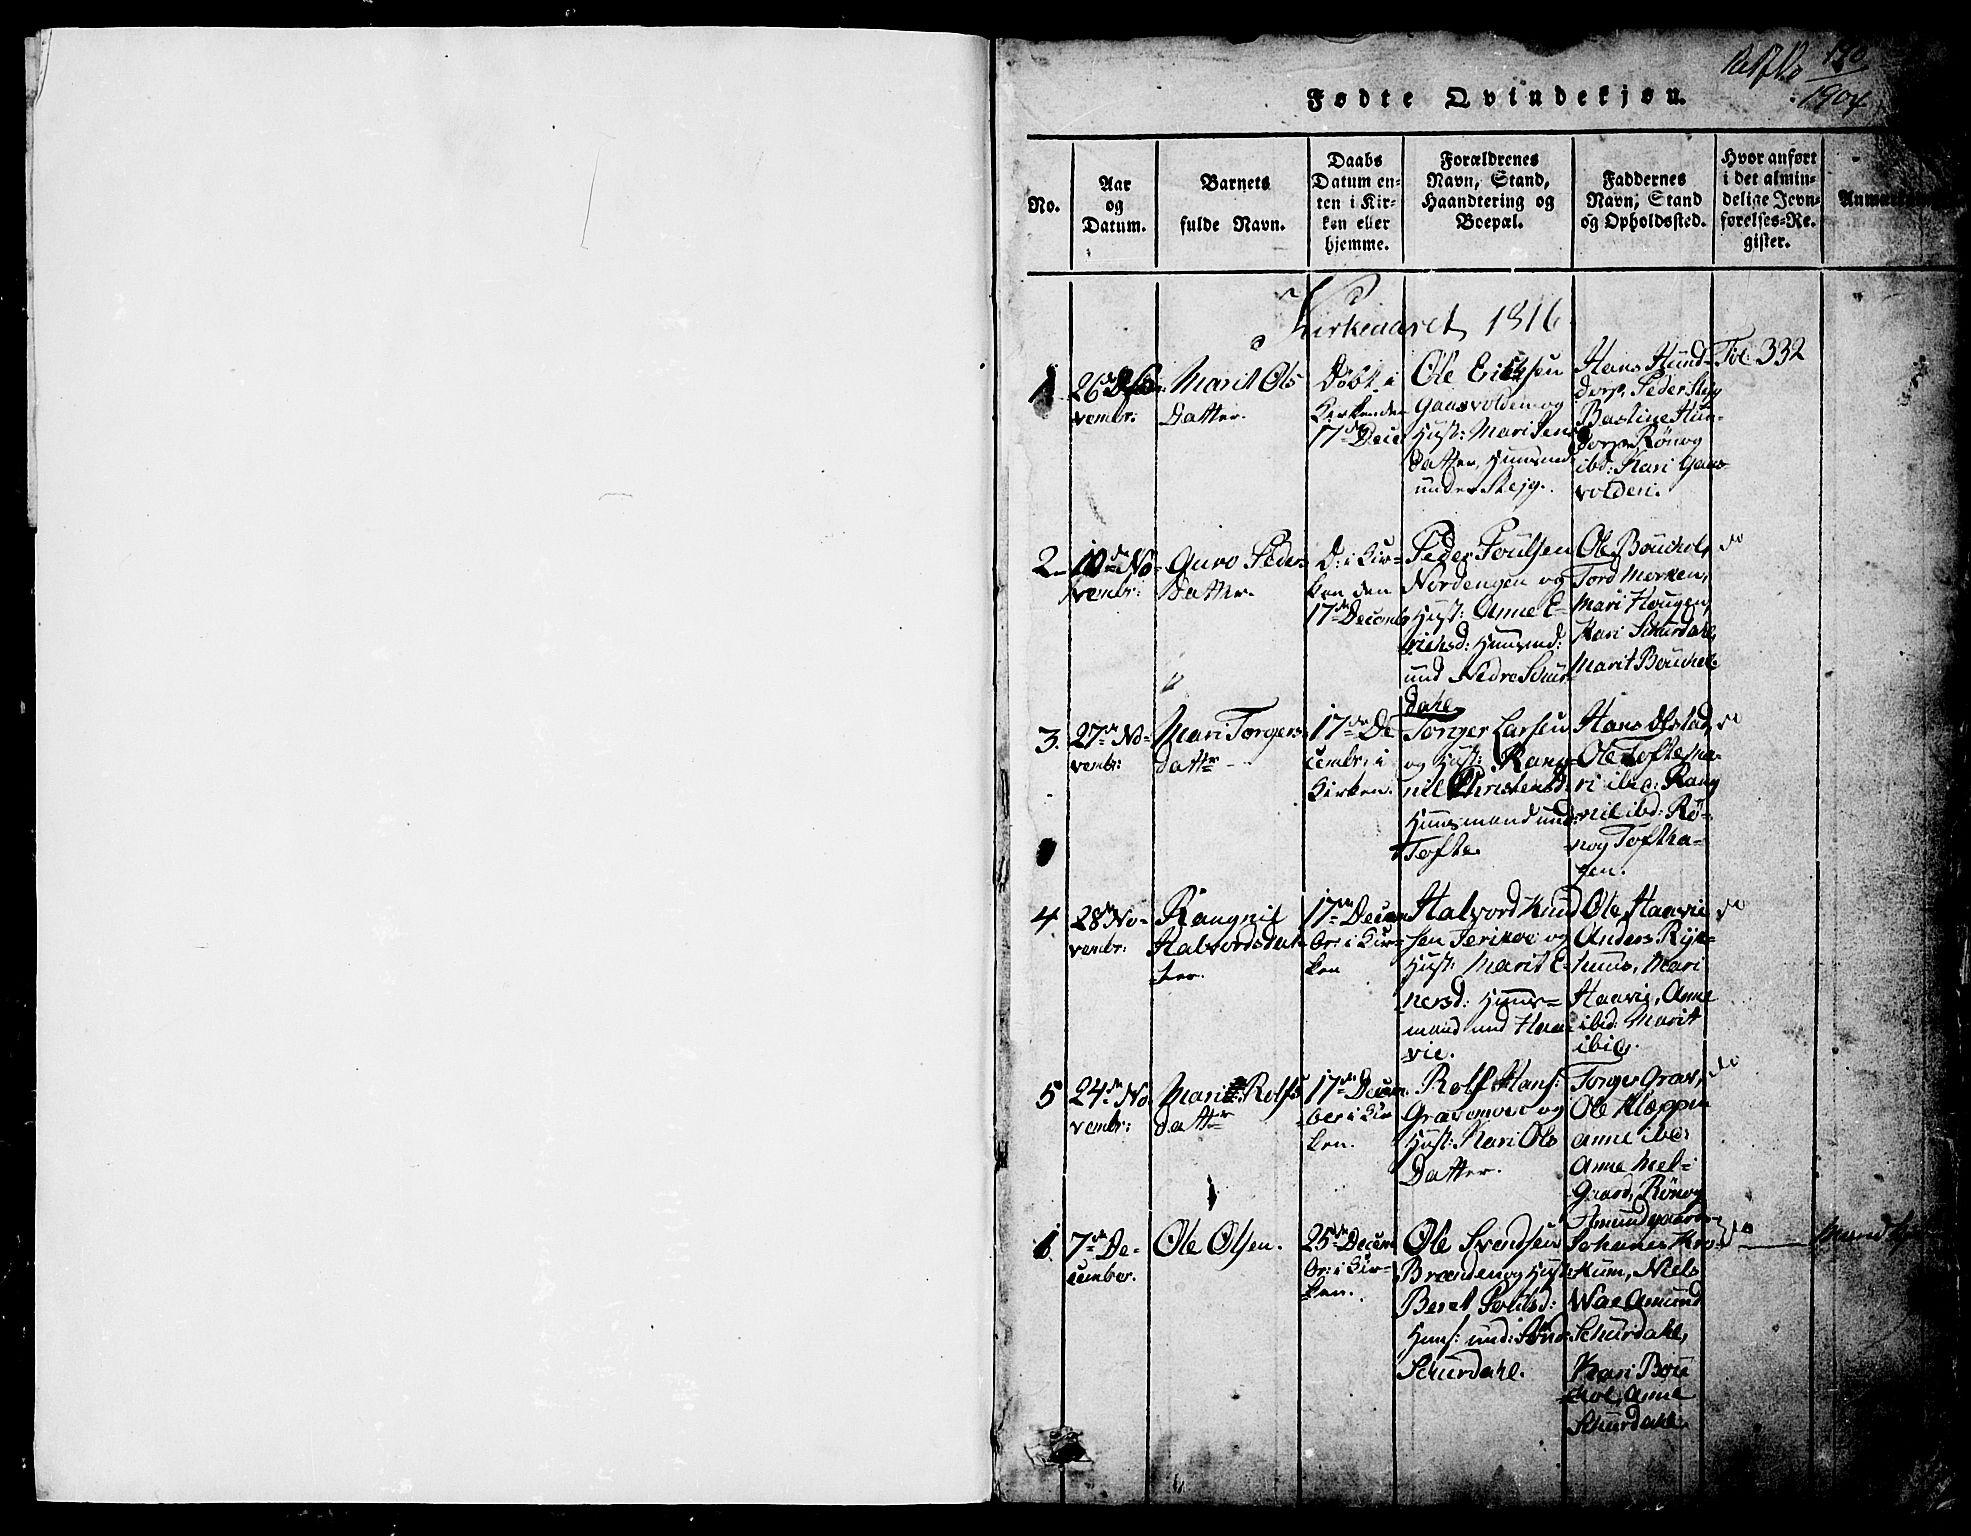 SAH, Fron prestekontor, H/Ha/Hab/L0001: Klokkerbok nr. 1, 1816-1843, s. 1